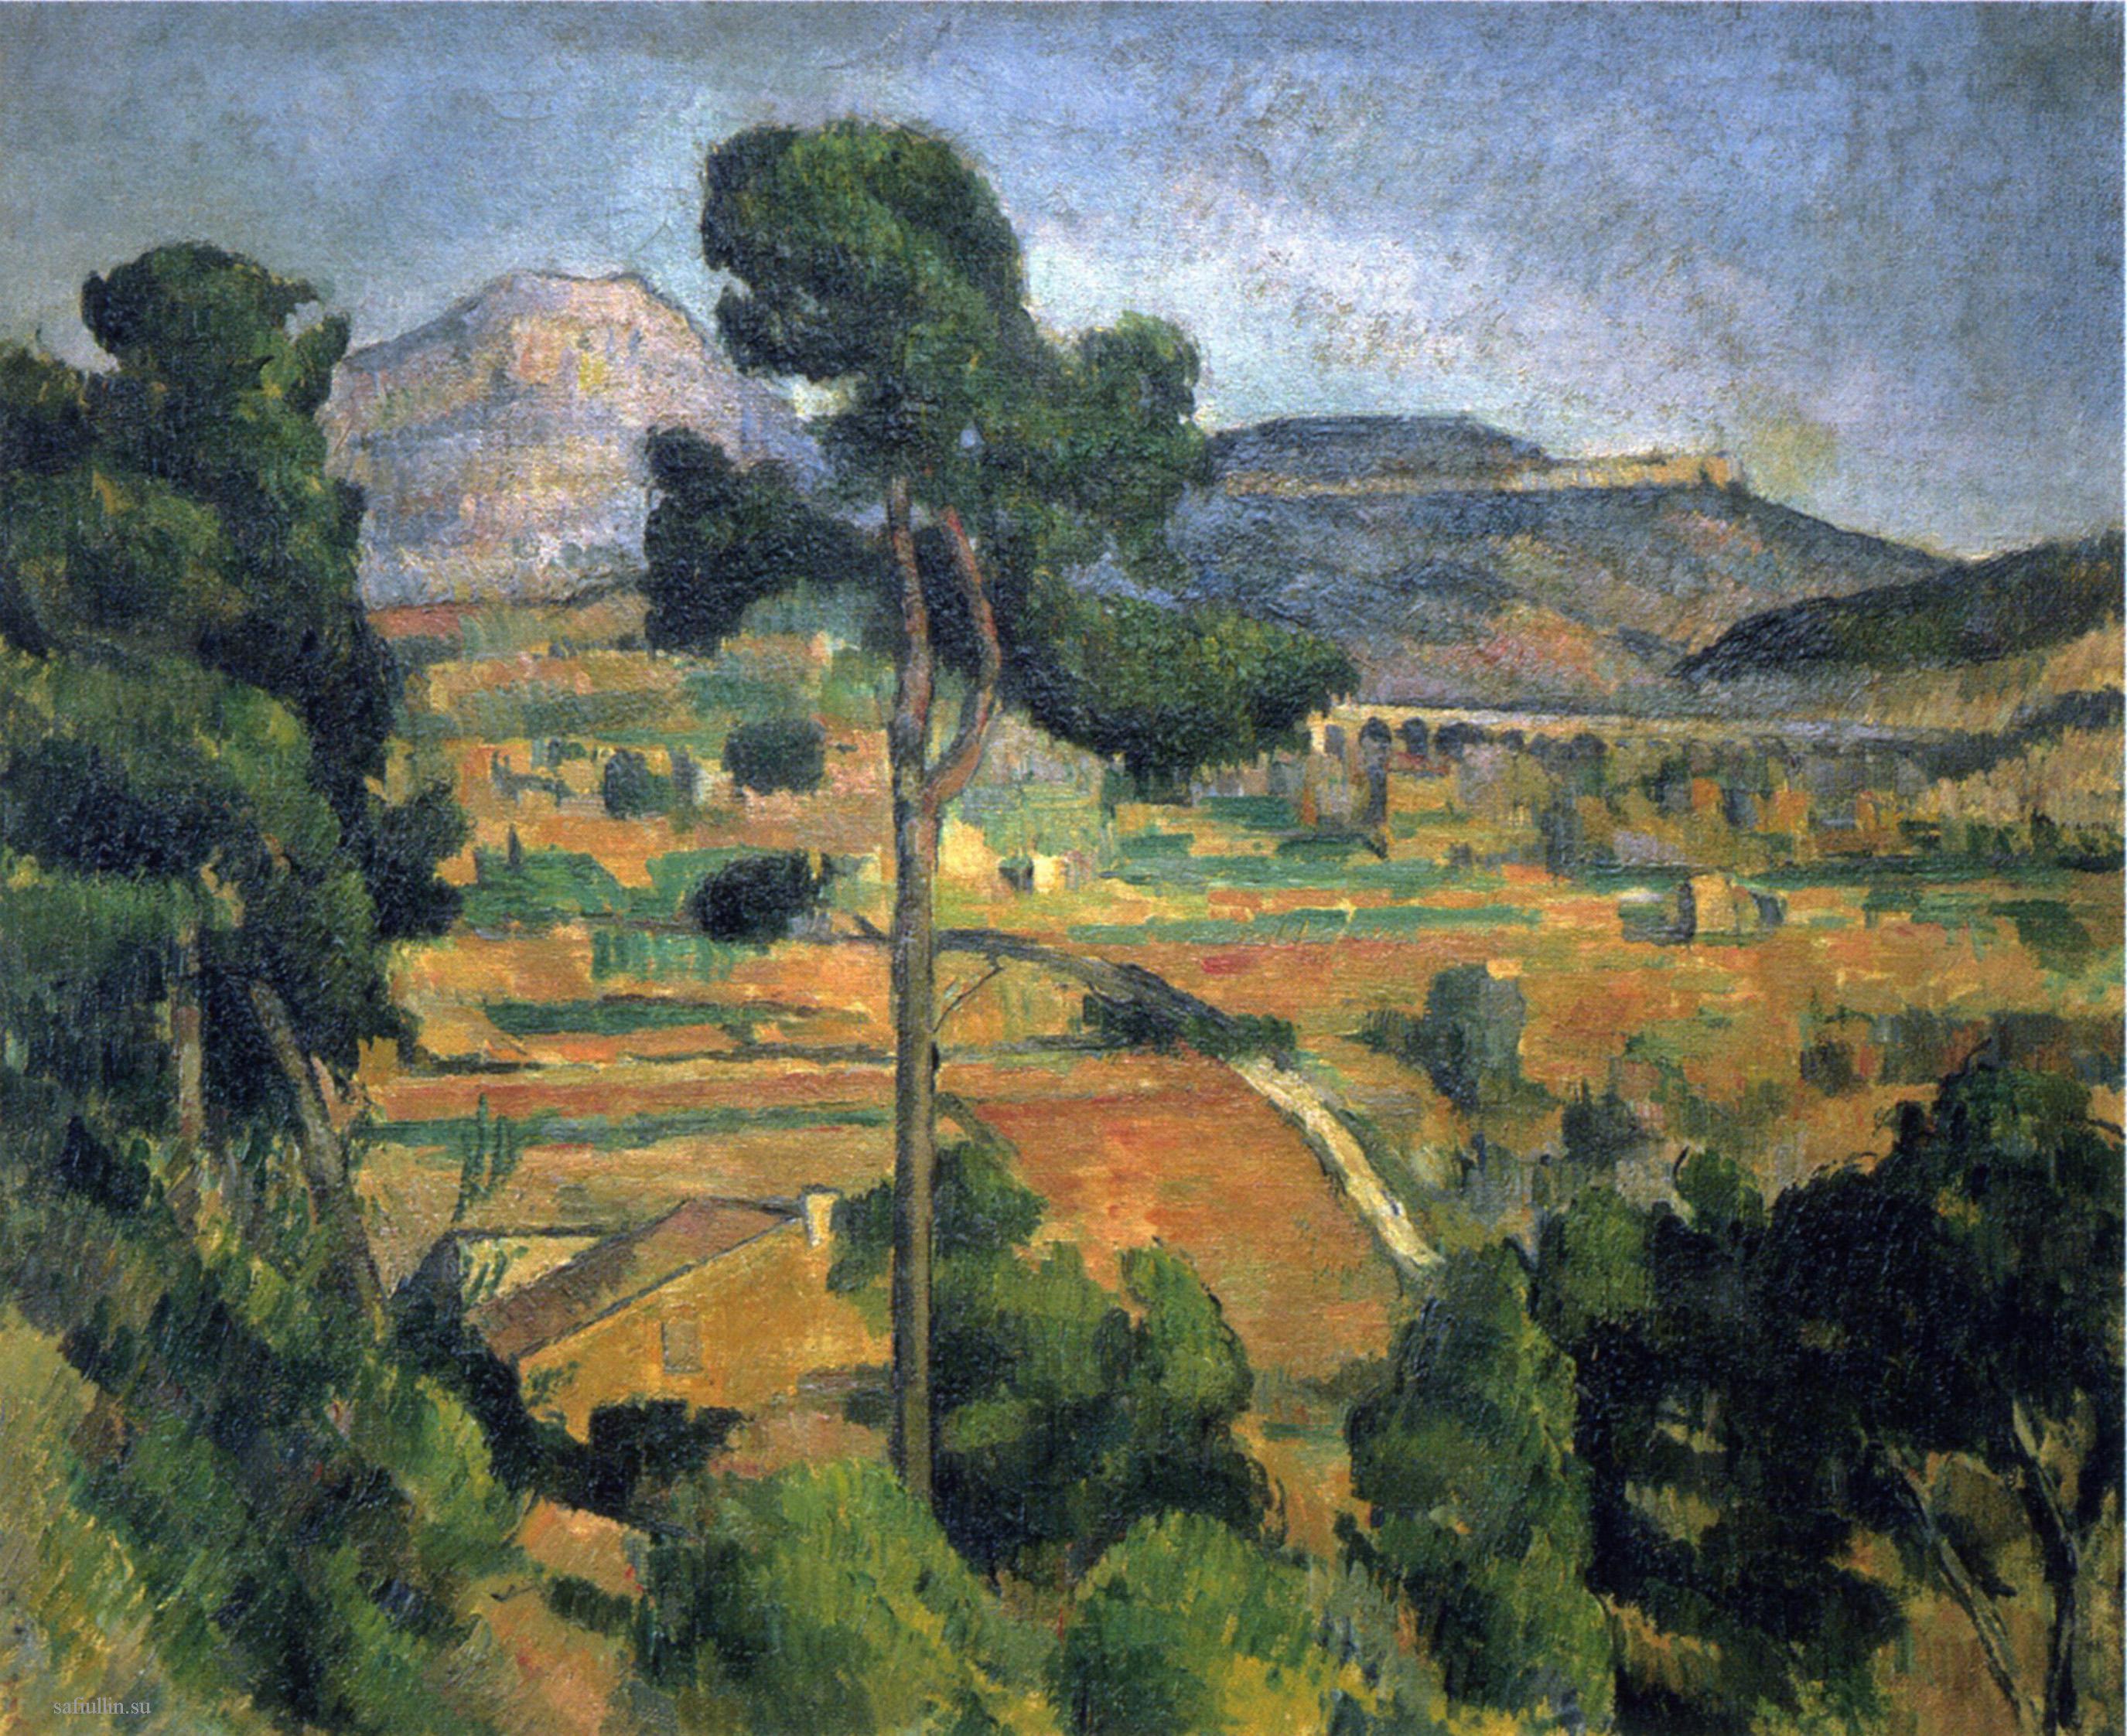 Сезанн Montagne Sainte-Victoire 1885 пейзажи природы Сафиуллин